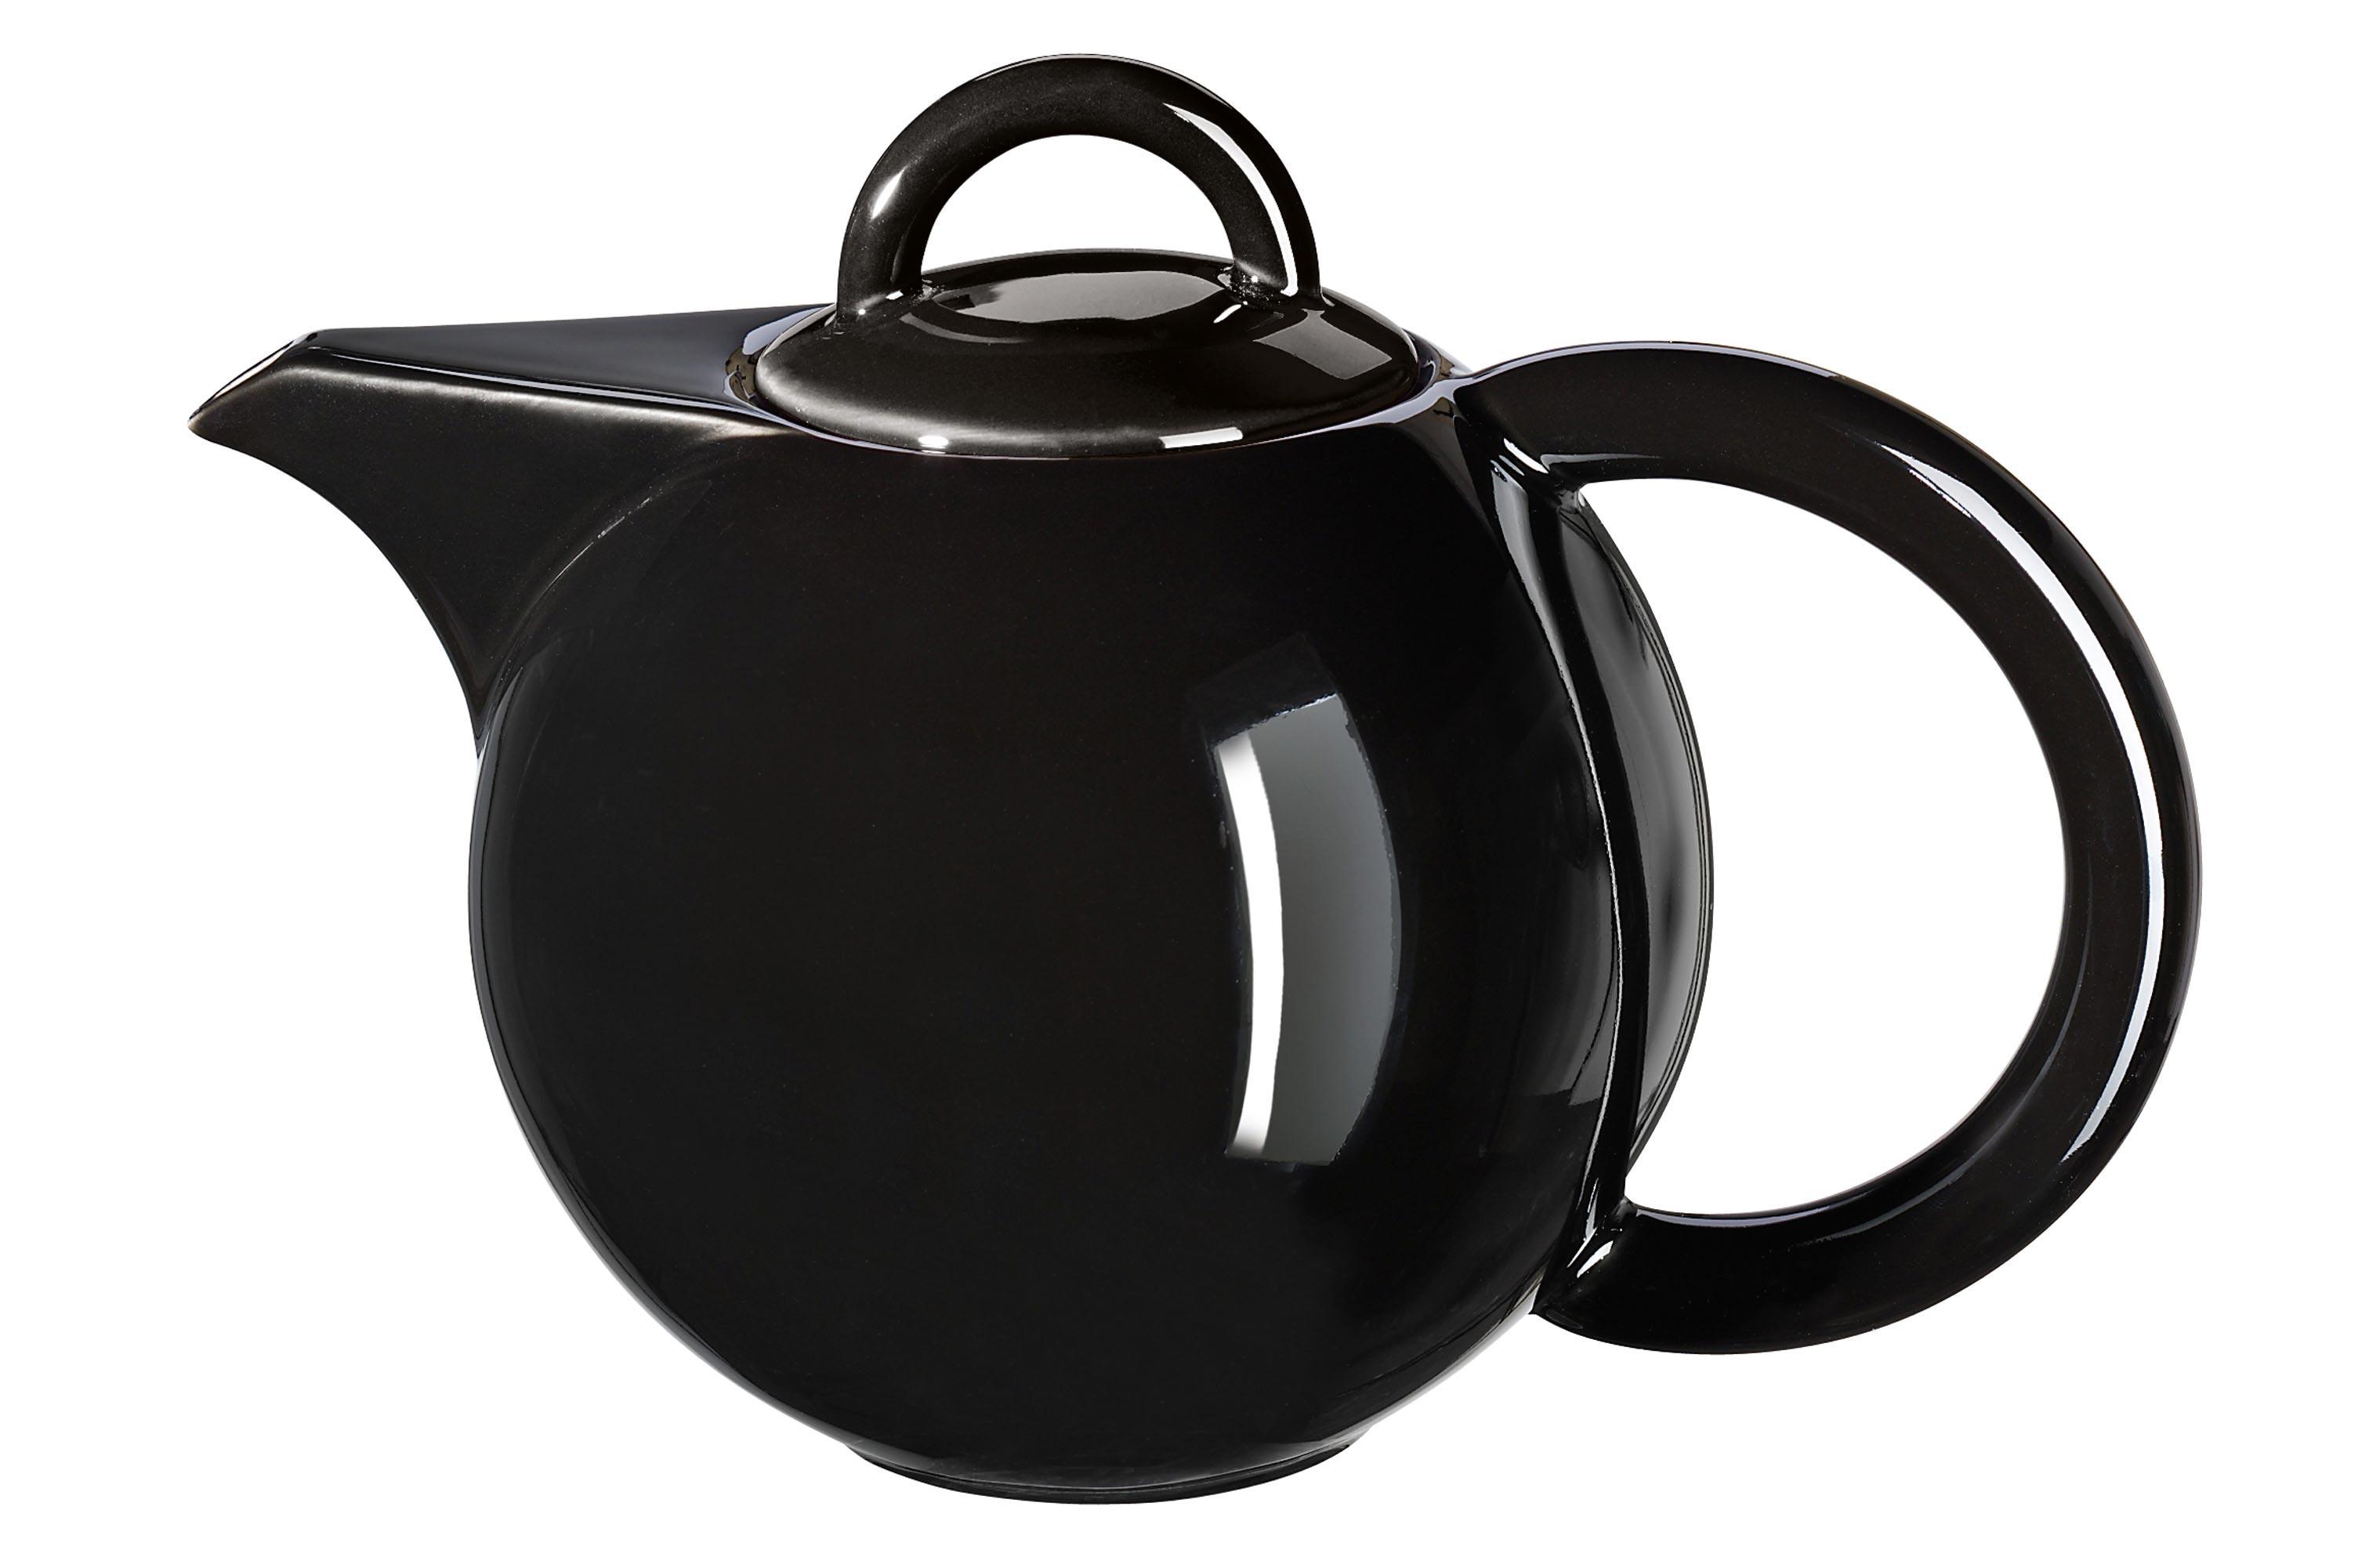 teekanne bauchig schwarz kannen kaffee tee produkte home by asa die asa selection. Black Bedroom Furniture Sets. Home Design Ideas